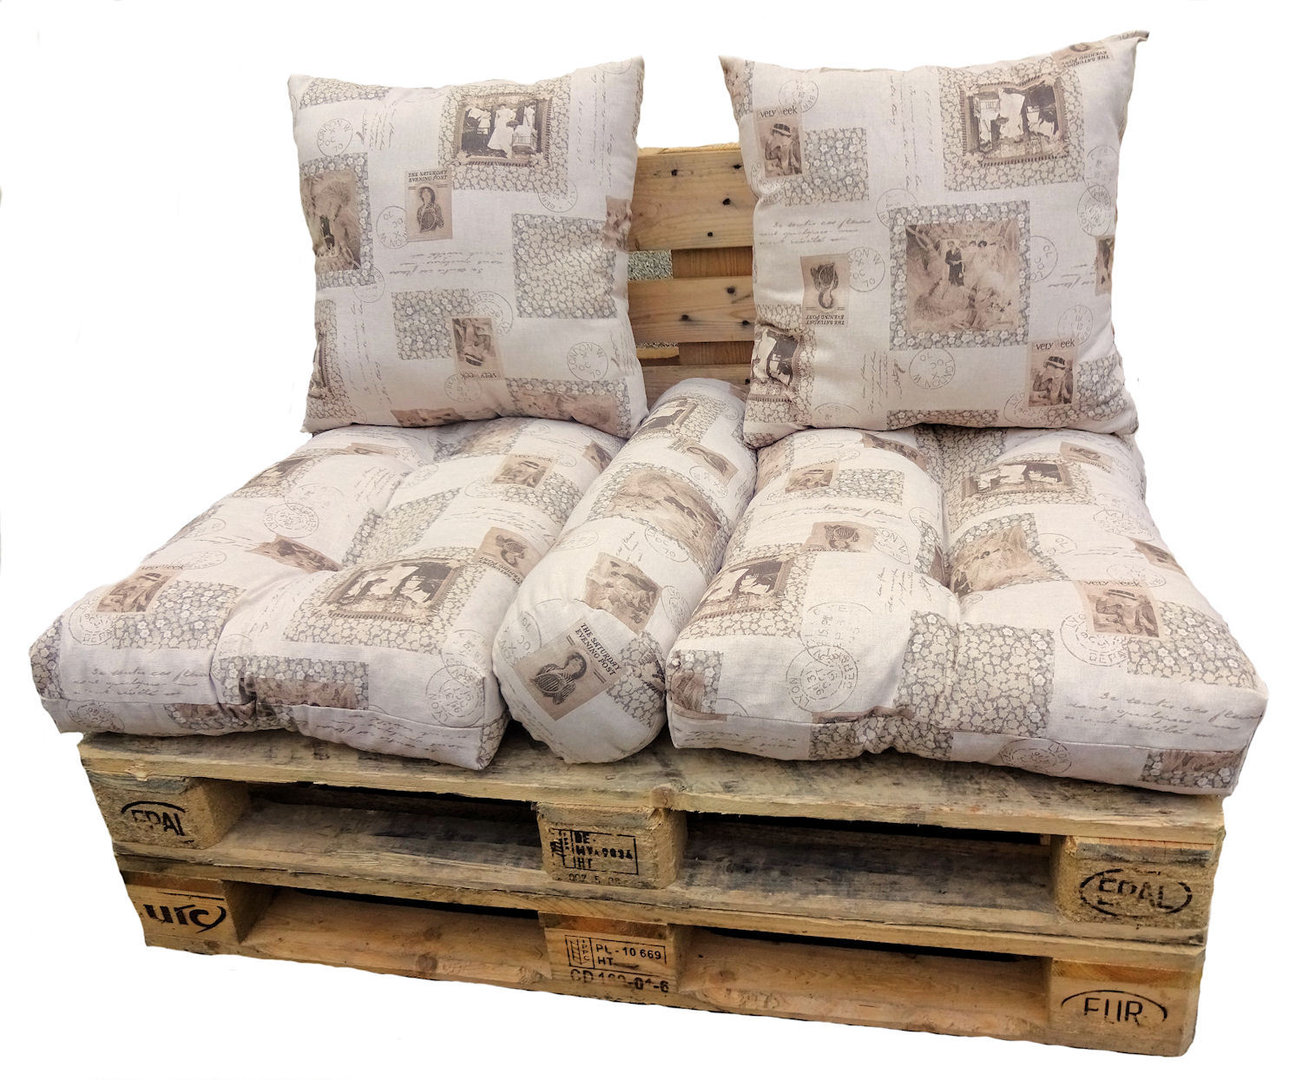 polster kissen f r europaletten palettenpolster rattan xxl. Black Bedroom Furniture Sets. Home Design Ideas